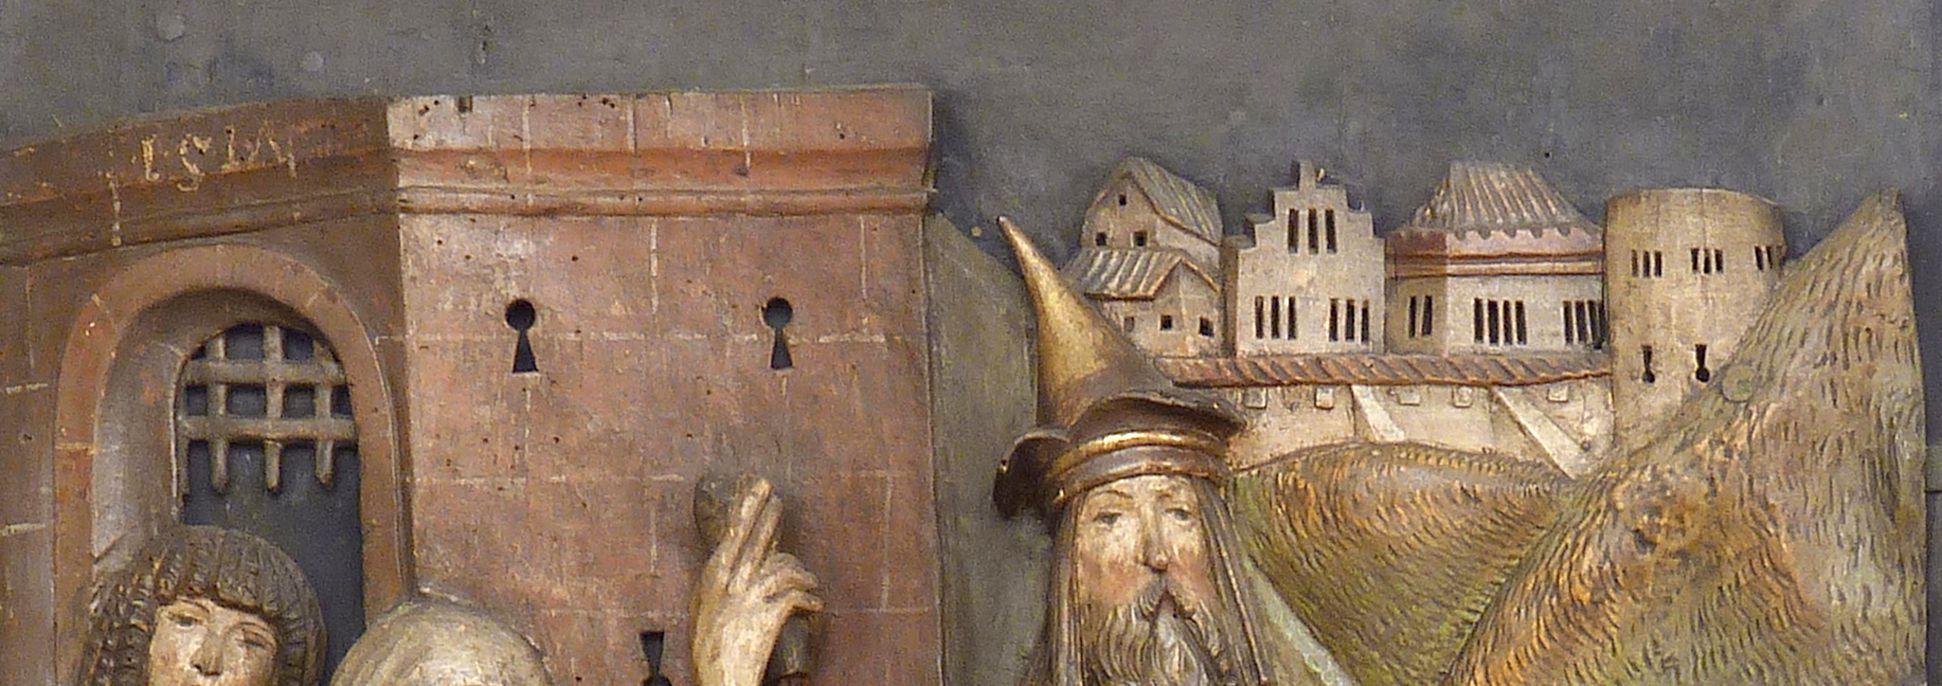 Kreuzaltar linker Flügel unten: Kreuzfall, Detail mit deutscher (!) Stadt, Datierung 1517